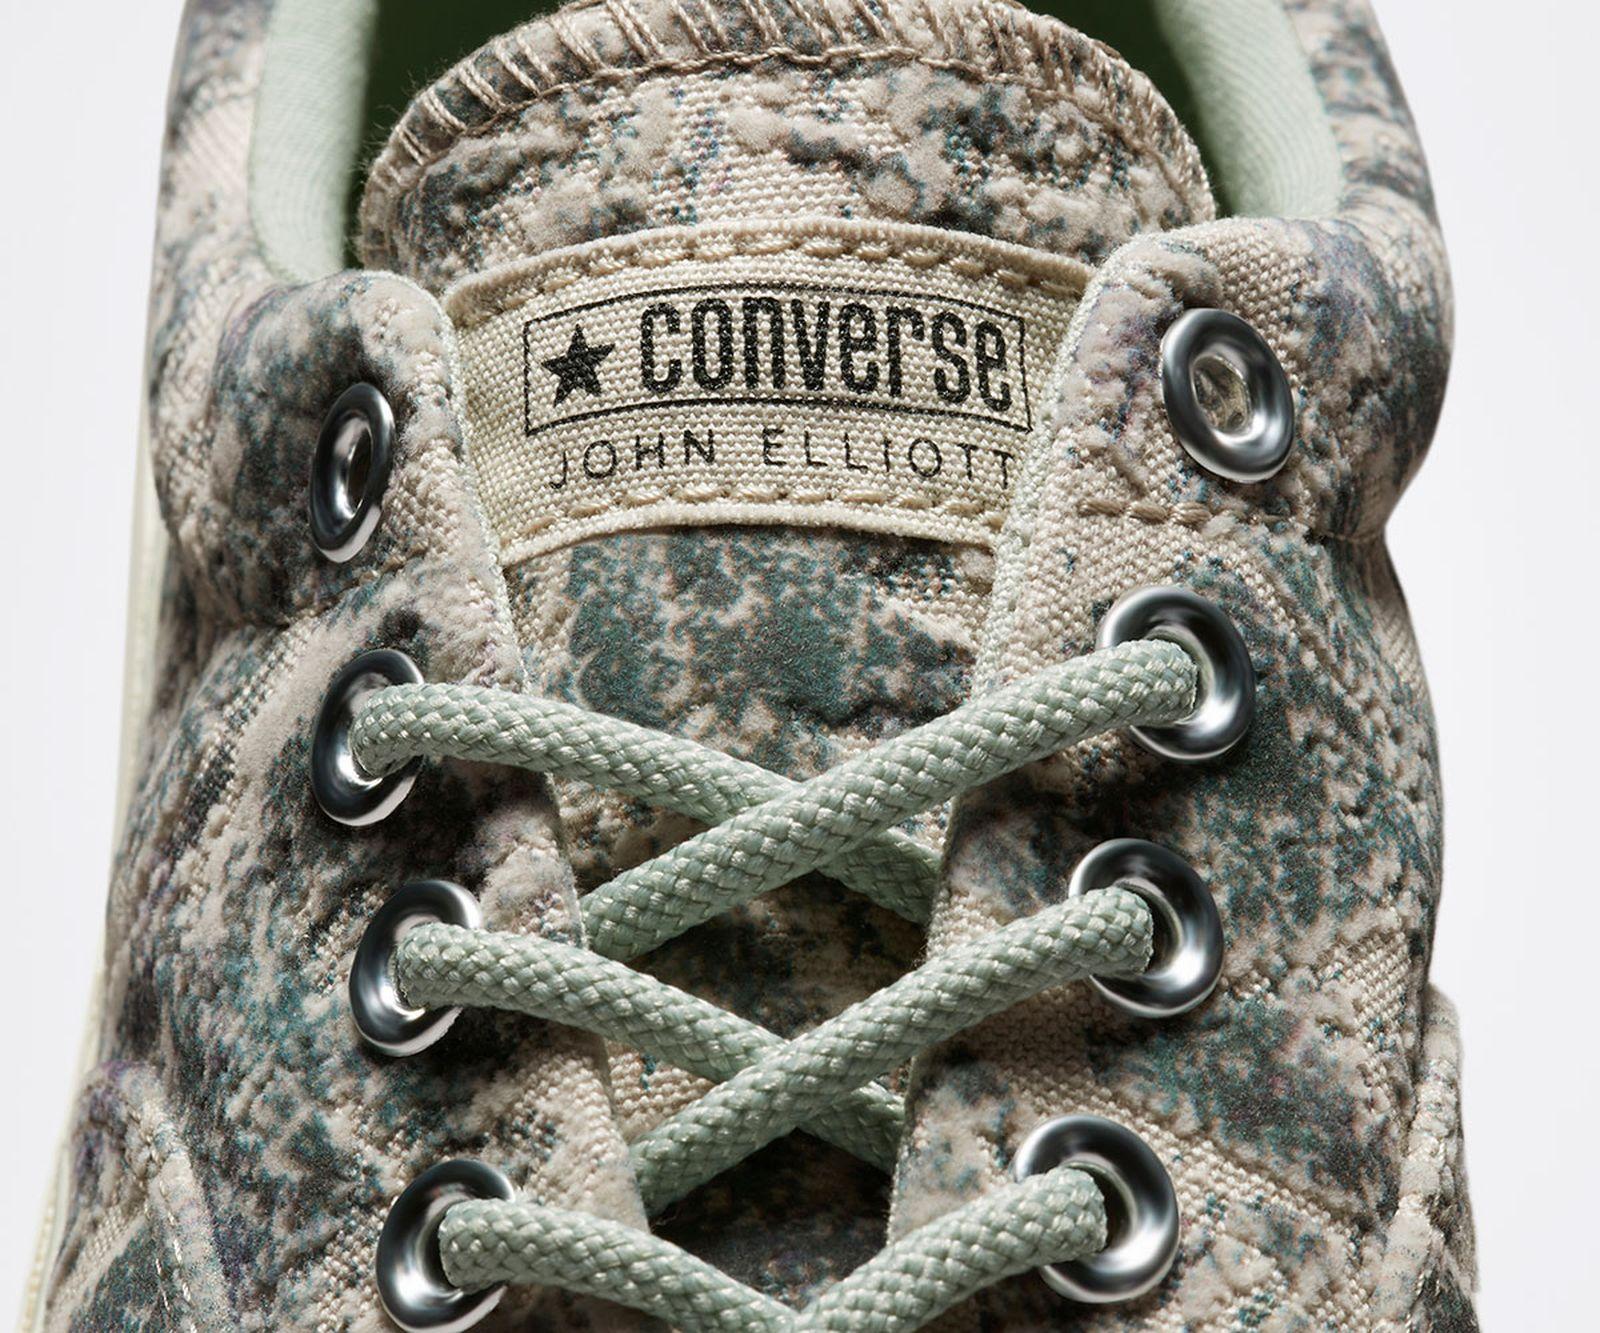 john-elliott-converse-skidgrip-release-date-price-12